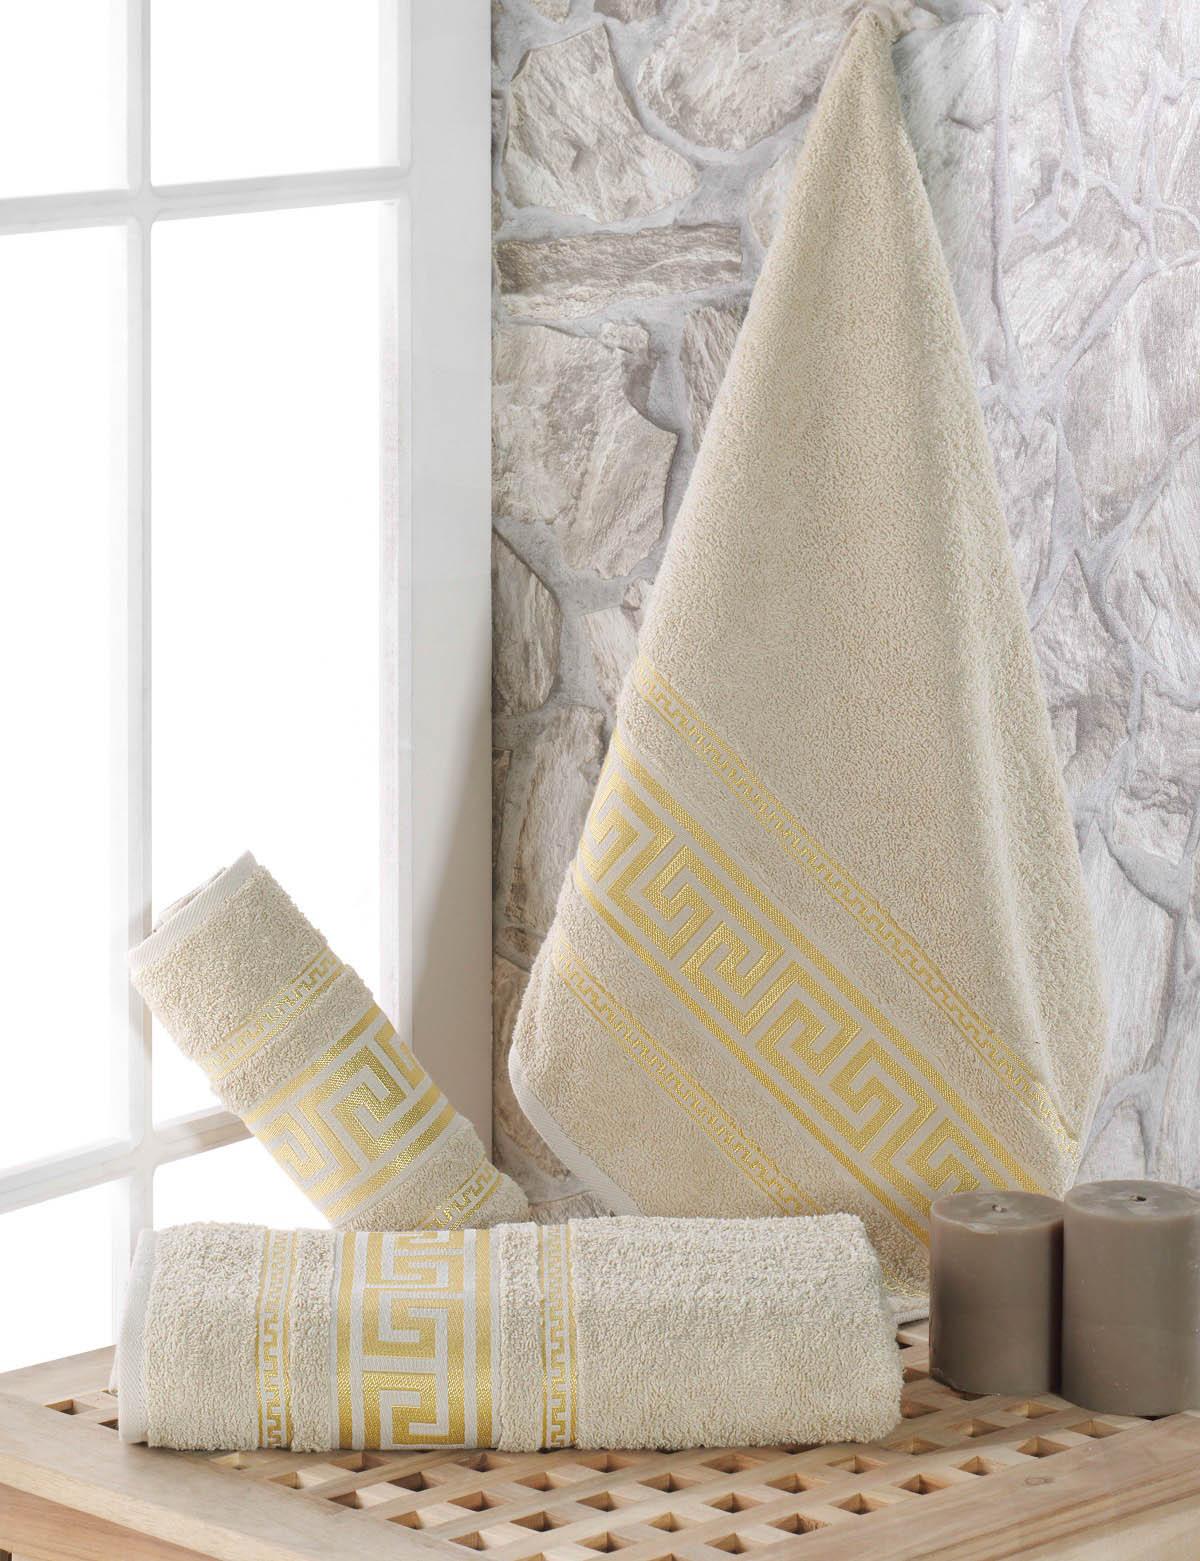 Полотенца Karna Полотенце Iteka Цвет: Бежевый (70х140 см) karna karna полотенце innes цвет красный 70х140 см